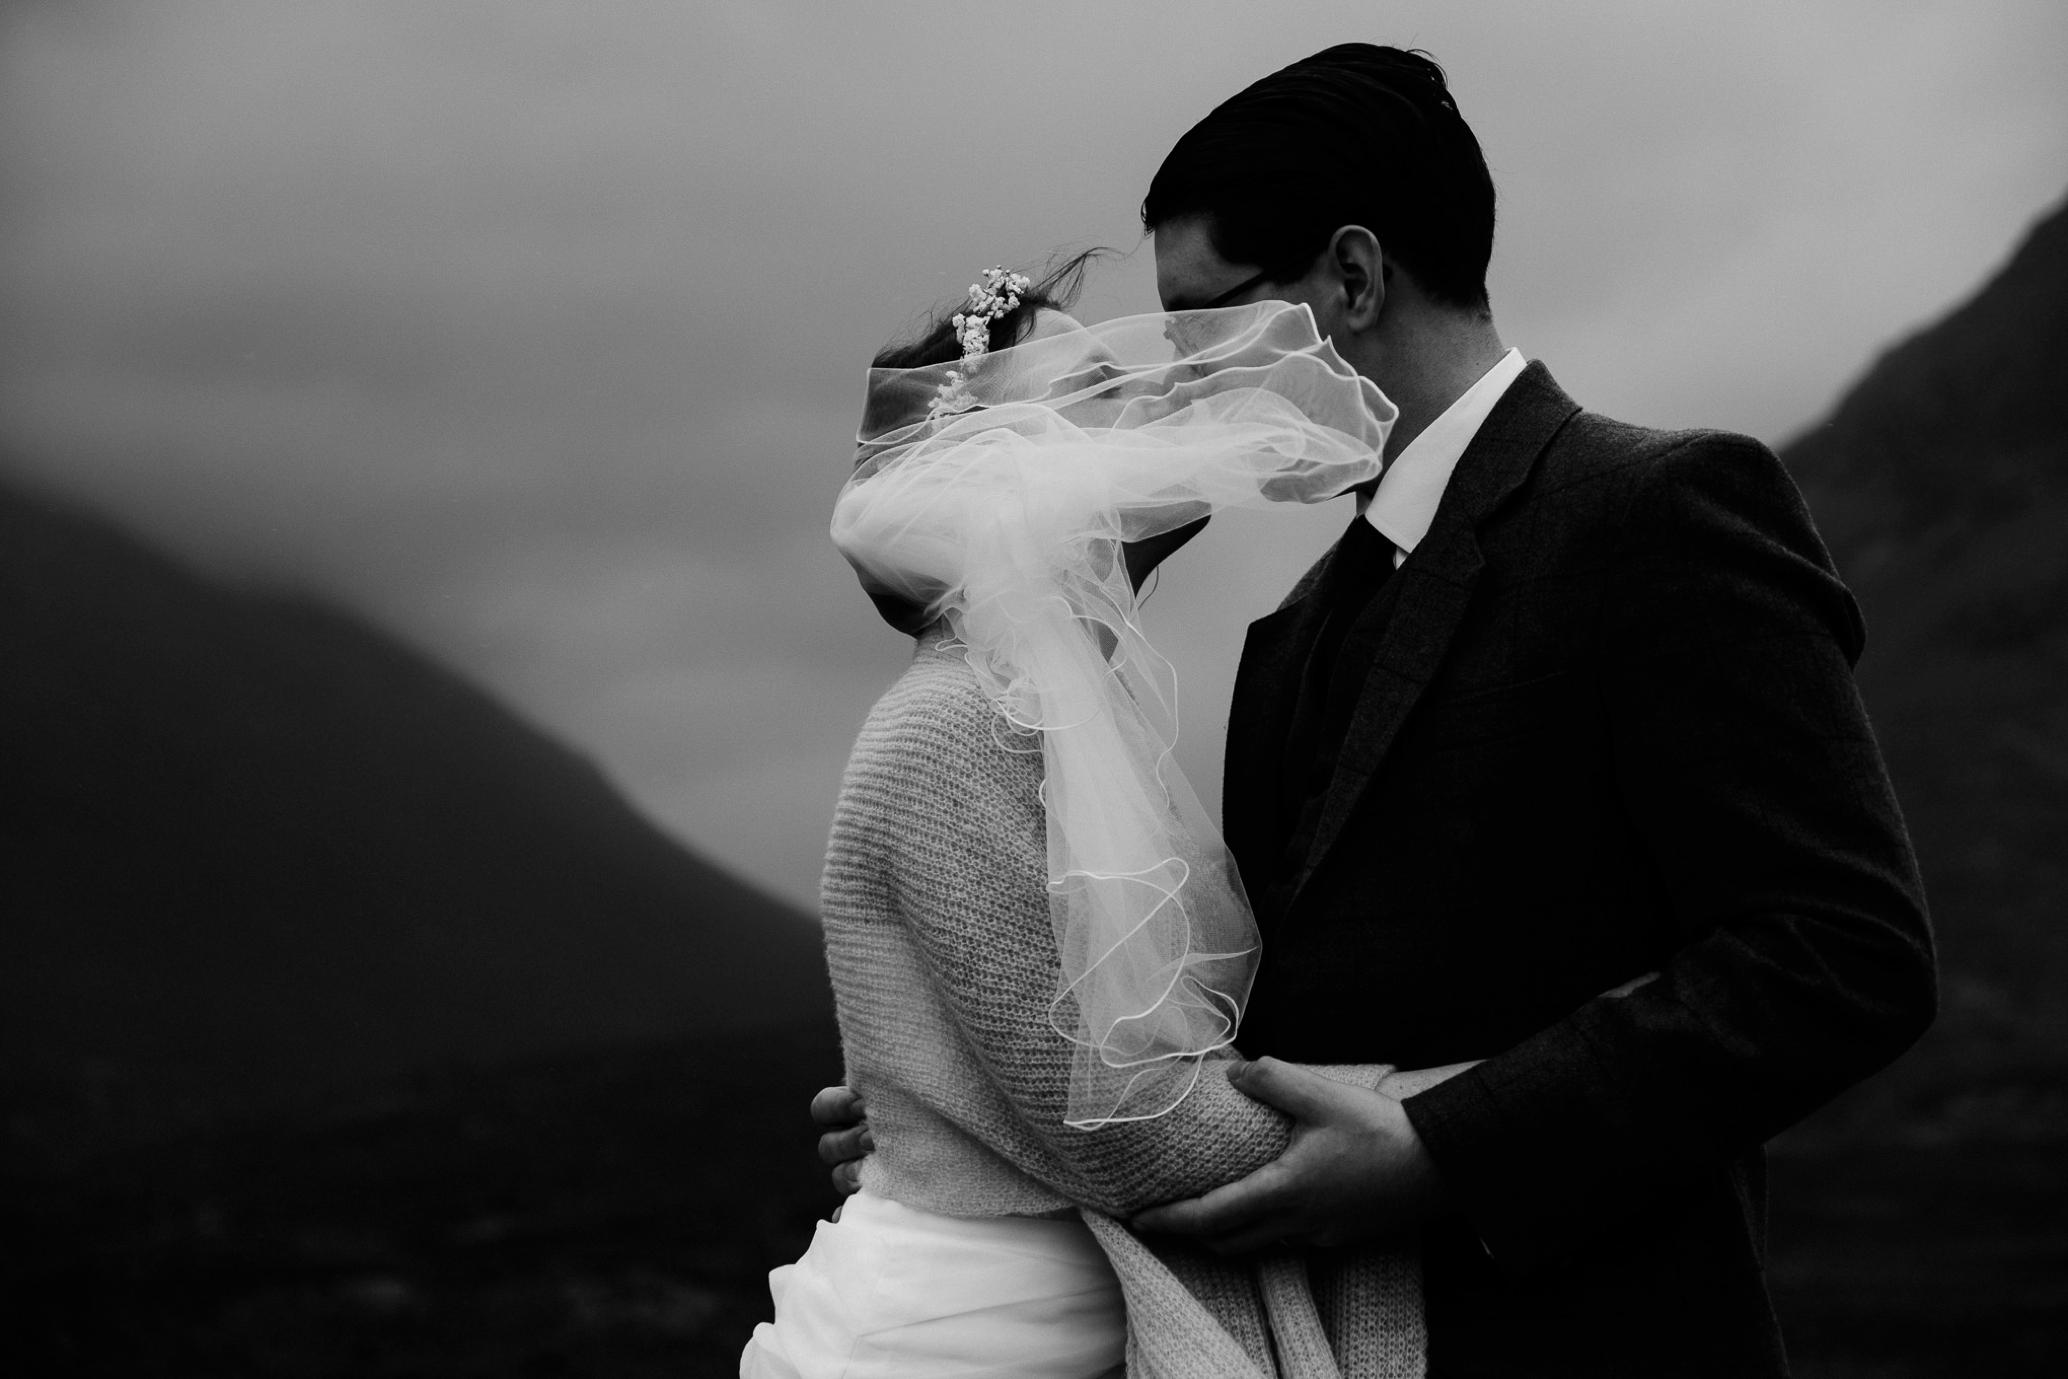 20170601_euan robertson weddings_051_WEB.jpg